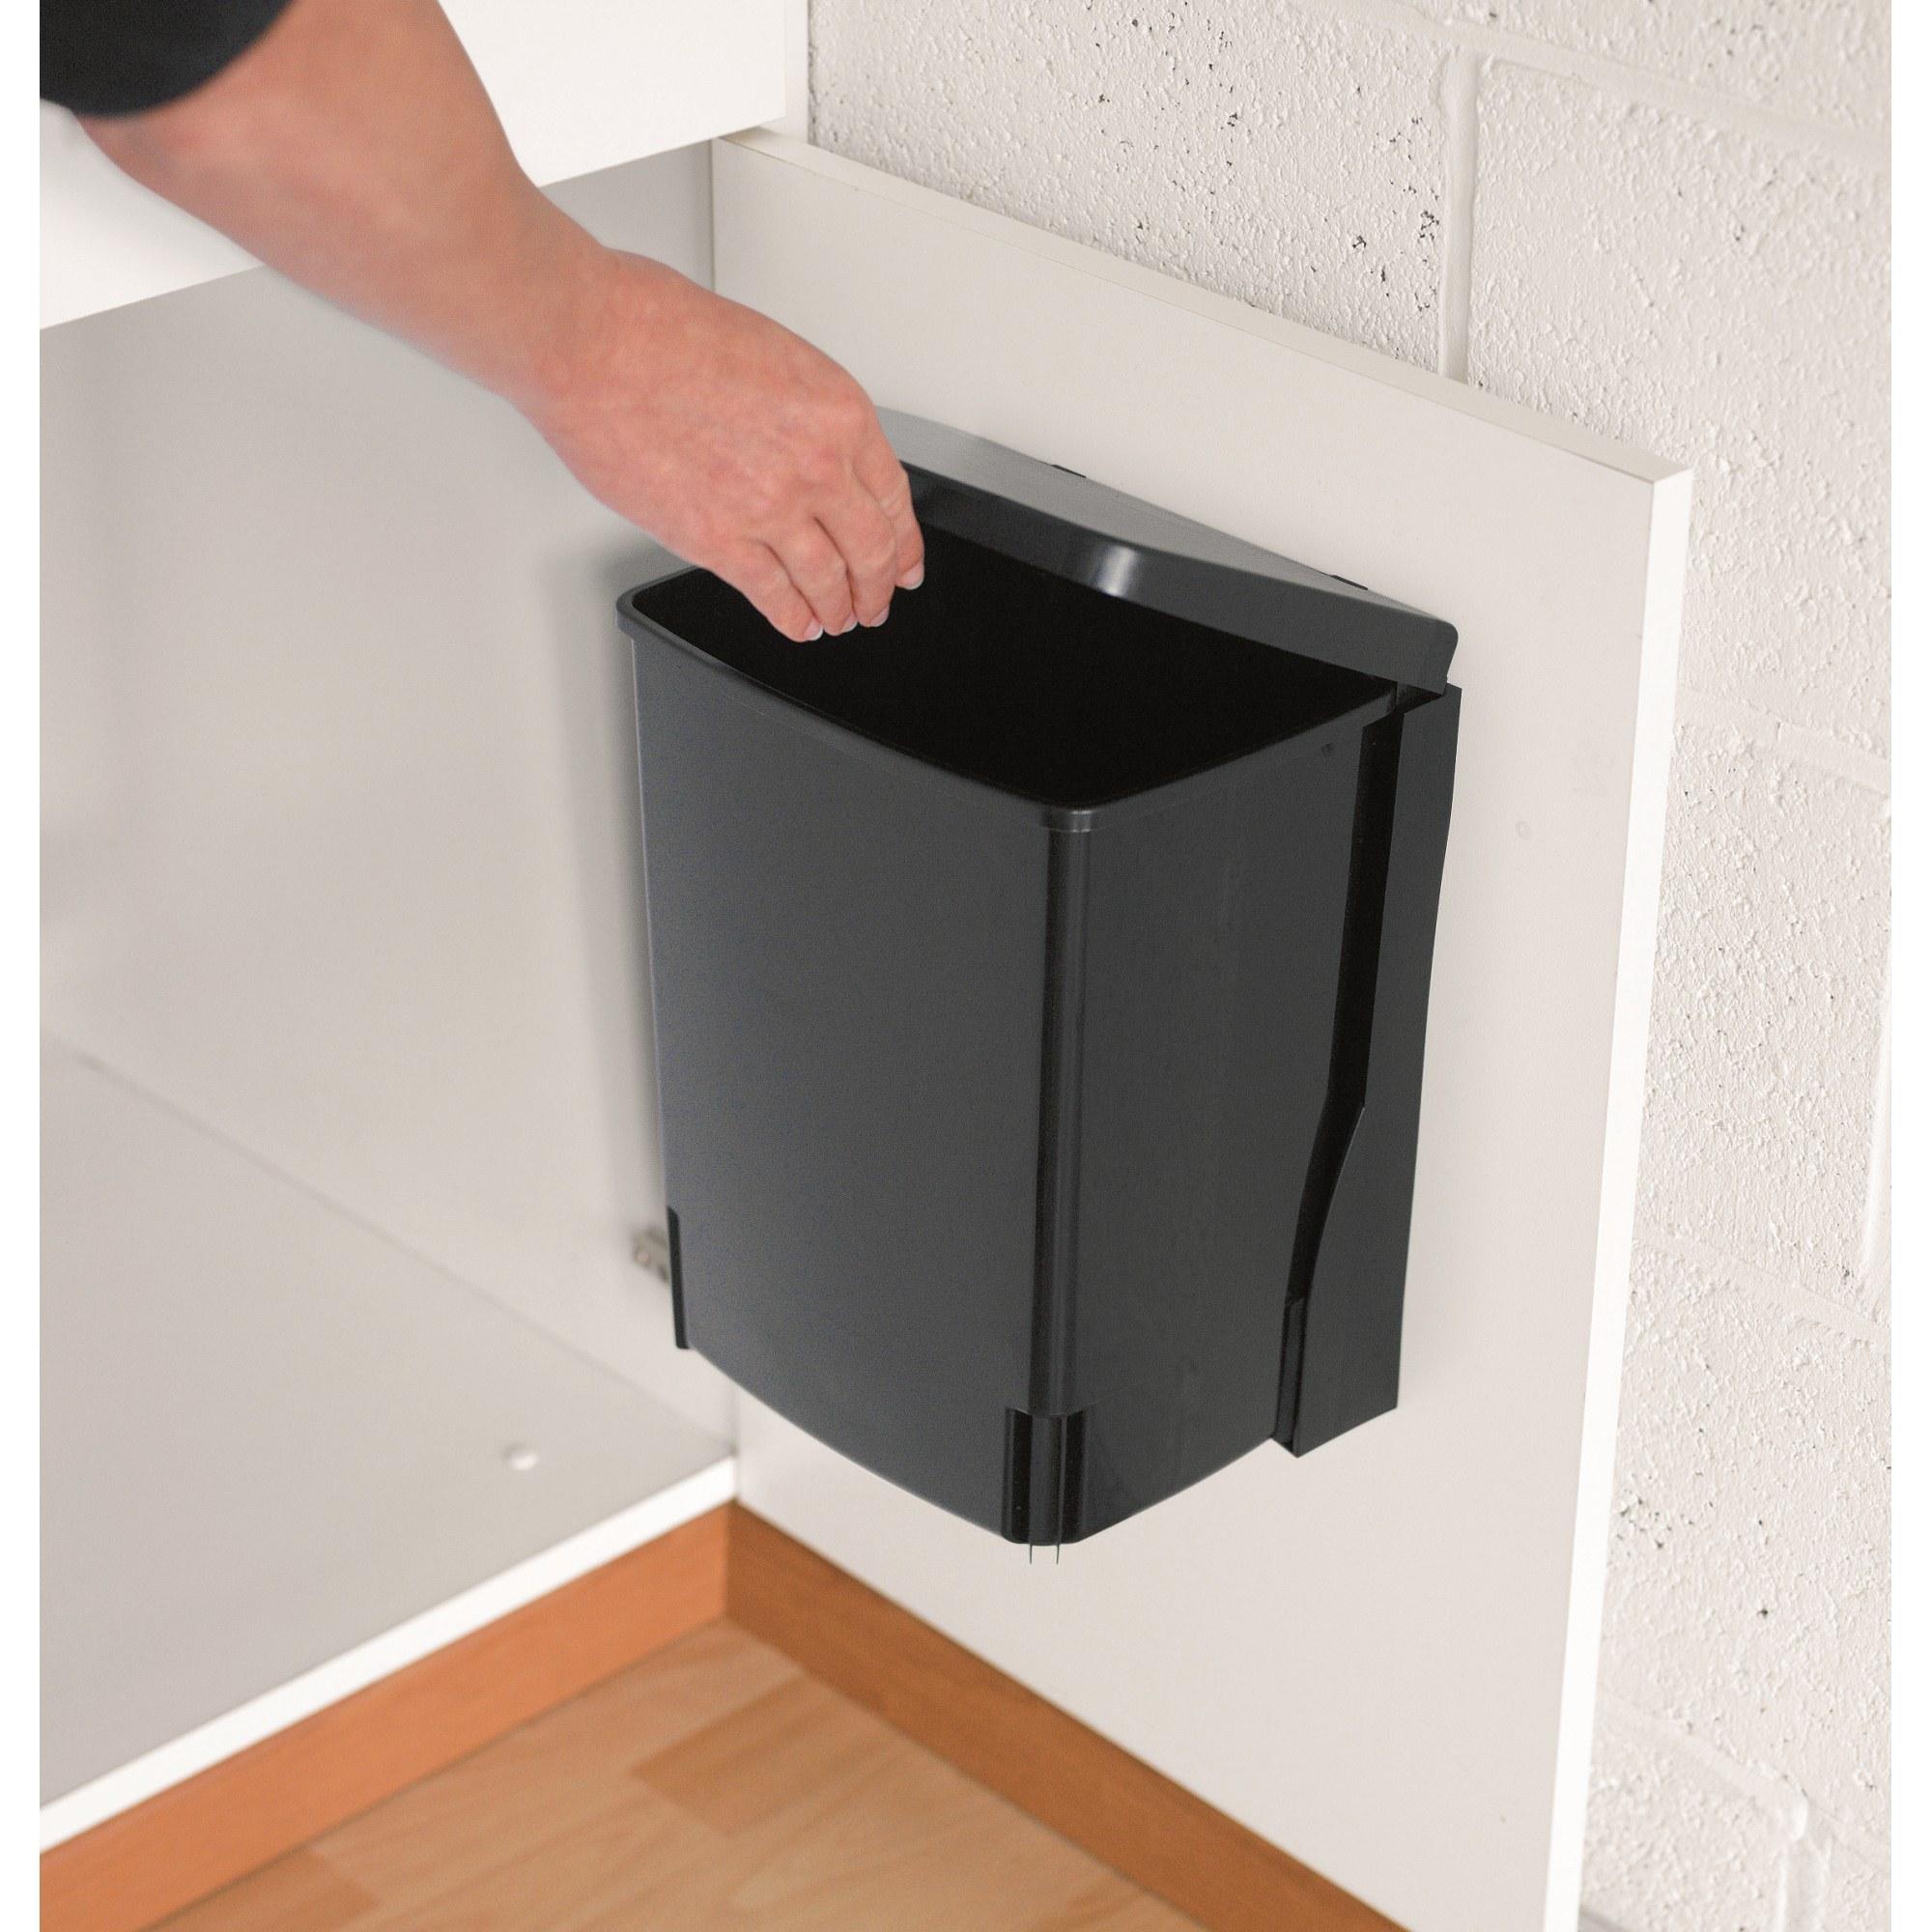 brabantia einbau m lleimer 10 liter black ebay. Black Bedroom Furniture Sets. Home Design Ideas